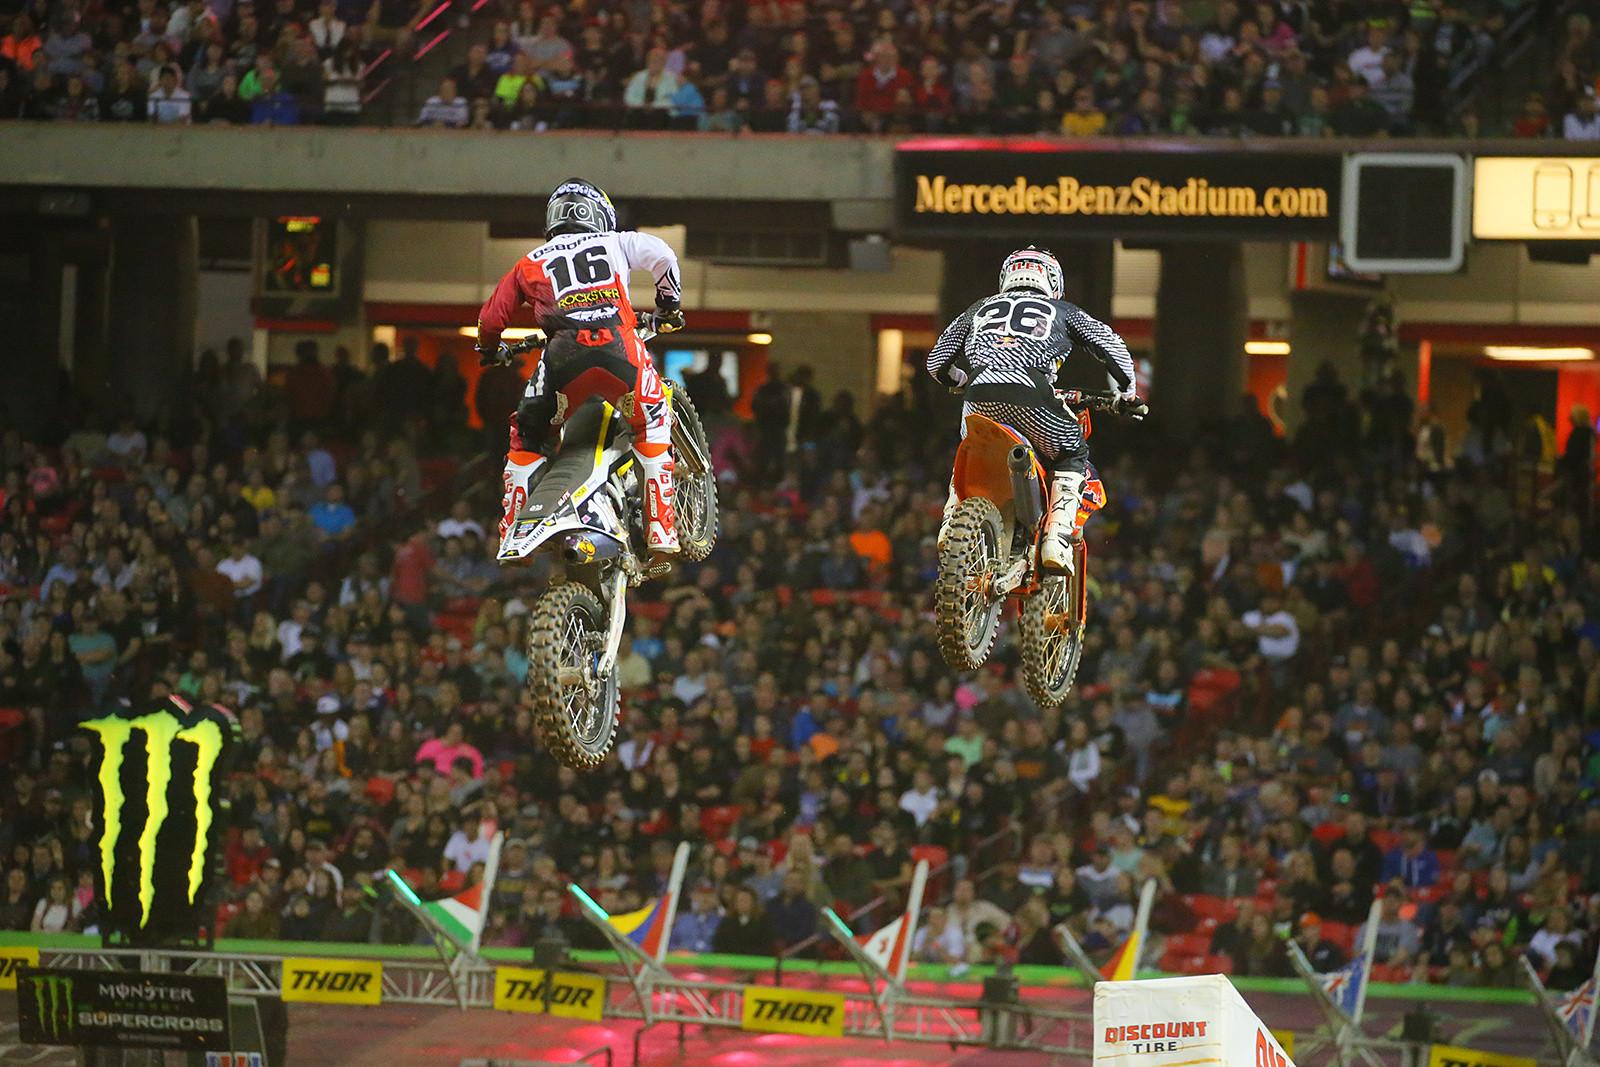 Zach Osborne and Alex Martin - Photo Blast: Atlanta Supercross - Motocross Pictures - Vital MX